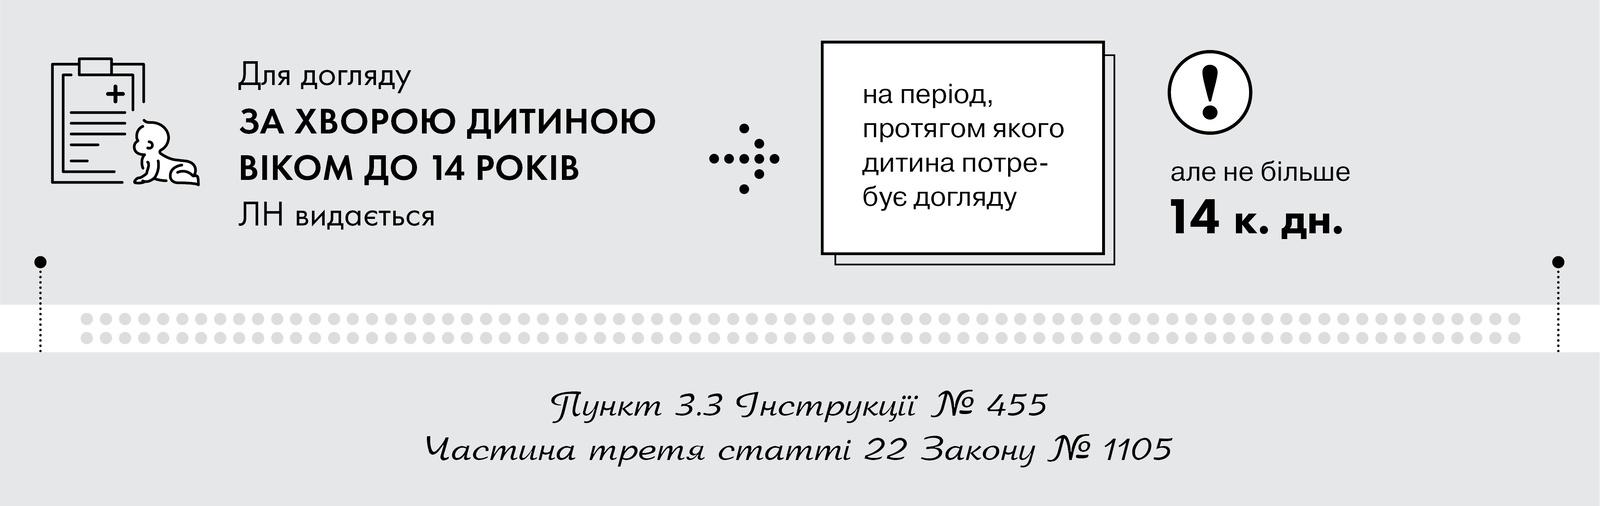 https://e.kadrovik.ua/sites/default/files/styles/popup/public/images/a8lVsAfIiJ5pAiMn1svF9lSEEjYBLugtNx6aMJ6bhLCIBM0VSB.jpg?itok=toHpc_wC